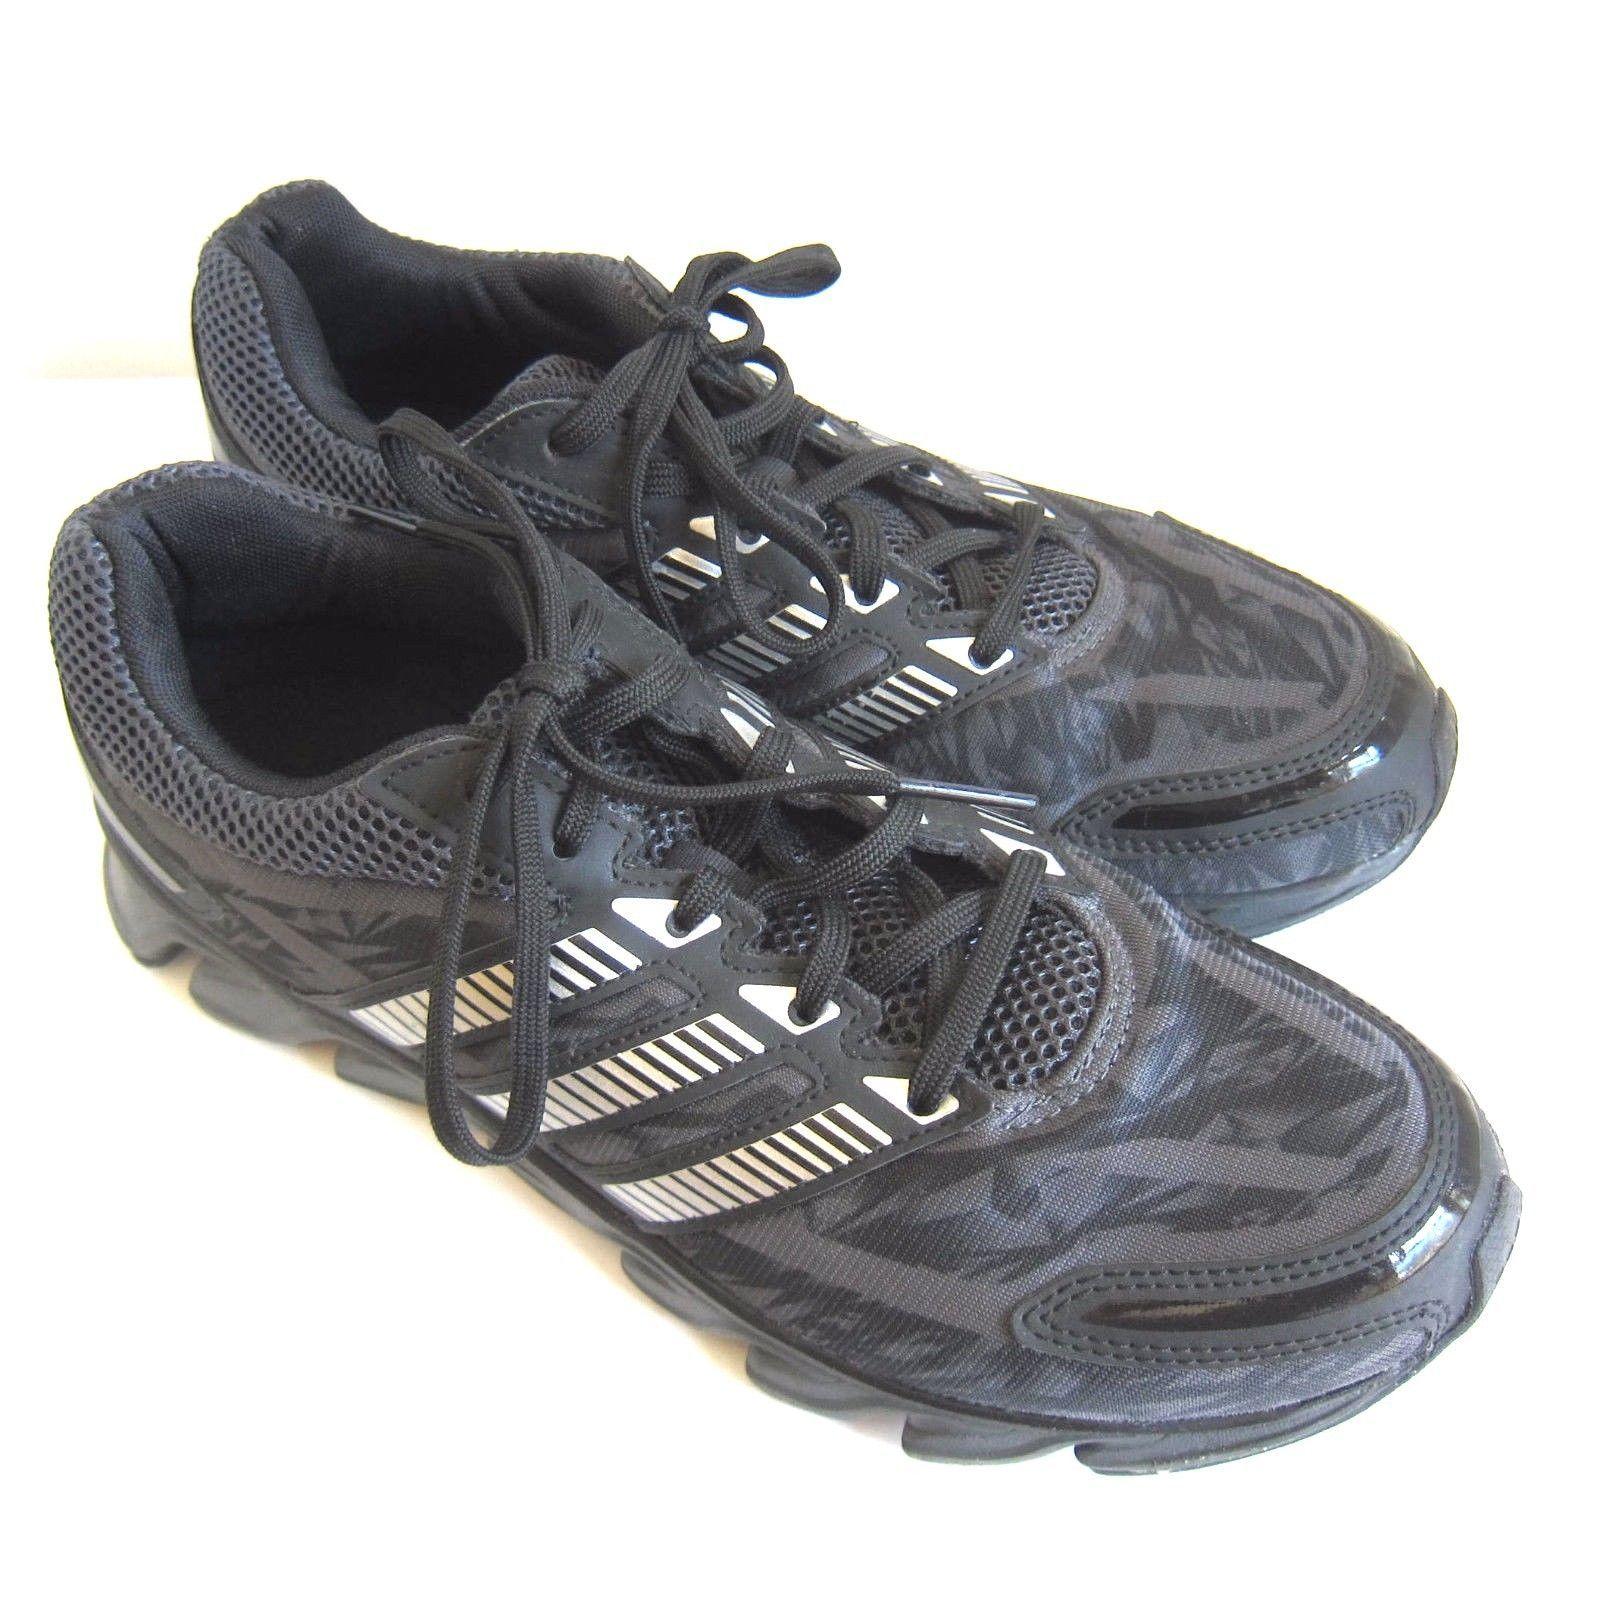 promo code adbd4 a86a0 C-1347 New Adidas Black Nylon Adiprene + and 50 similar items